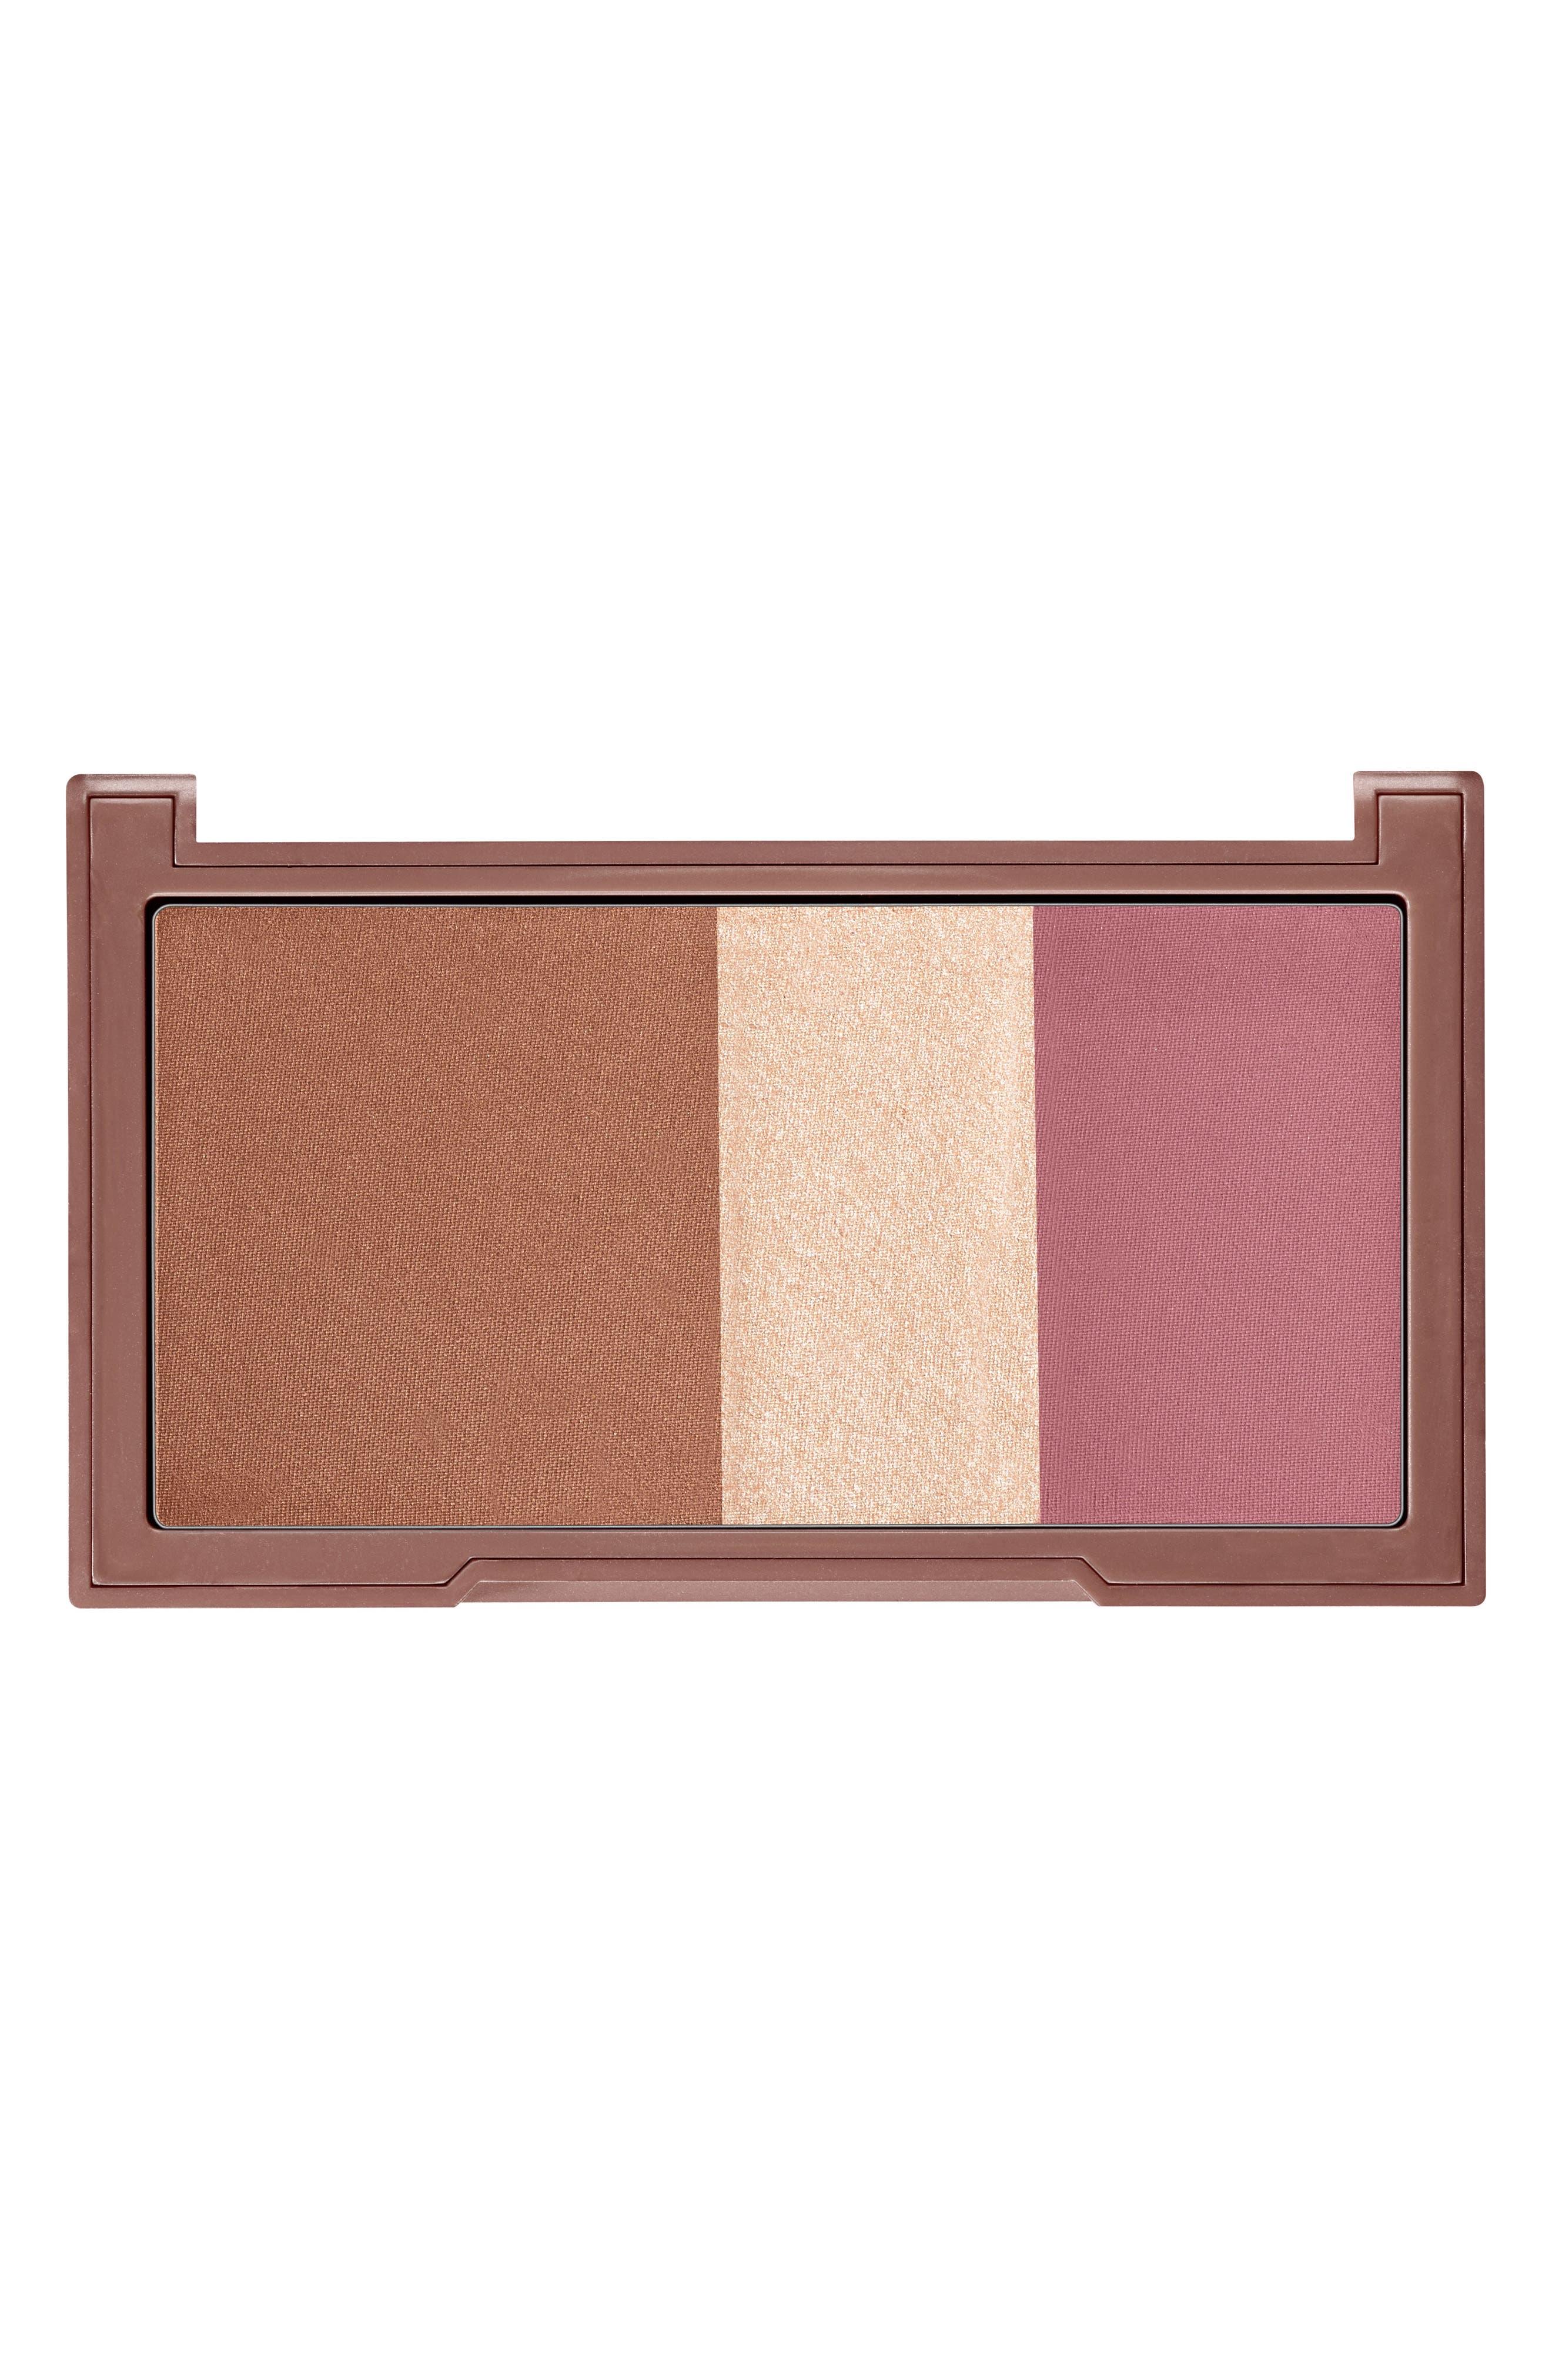 Naked Flushed Bronzer, Highlighter & Blush Palette,                             Alternate thumbnail 3, color,                             SESSO